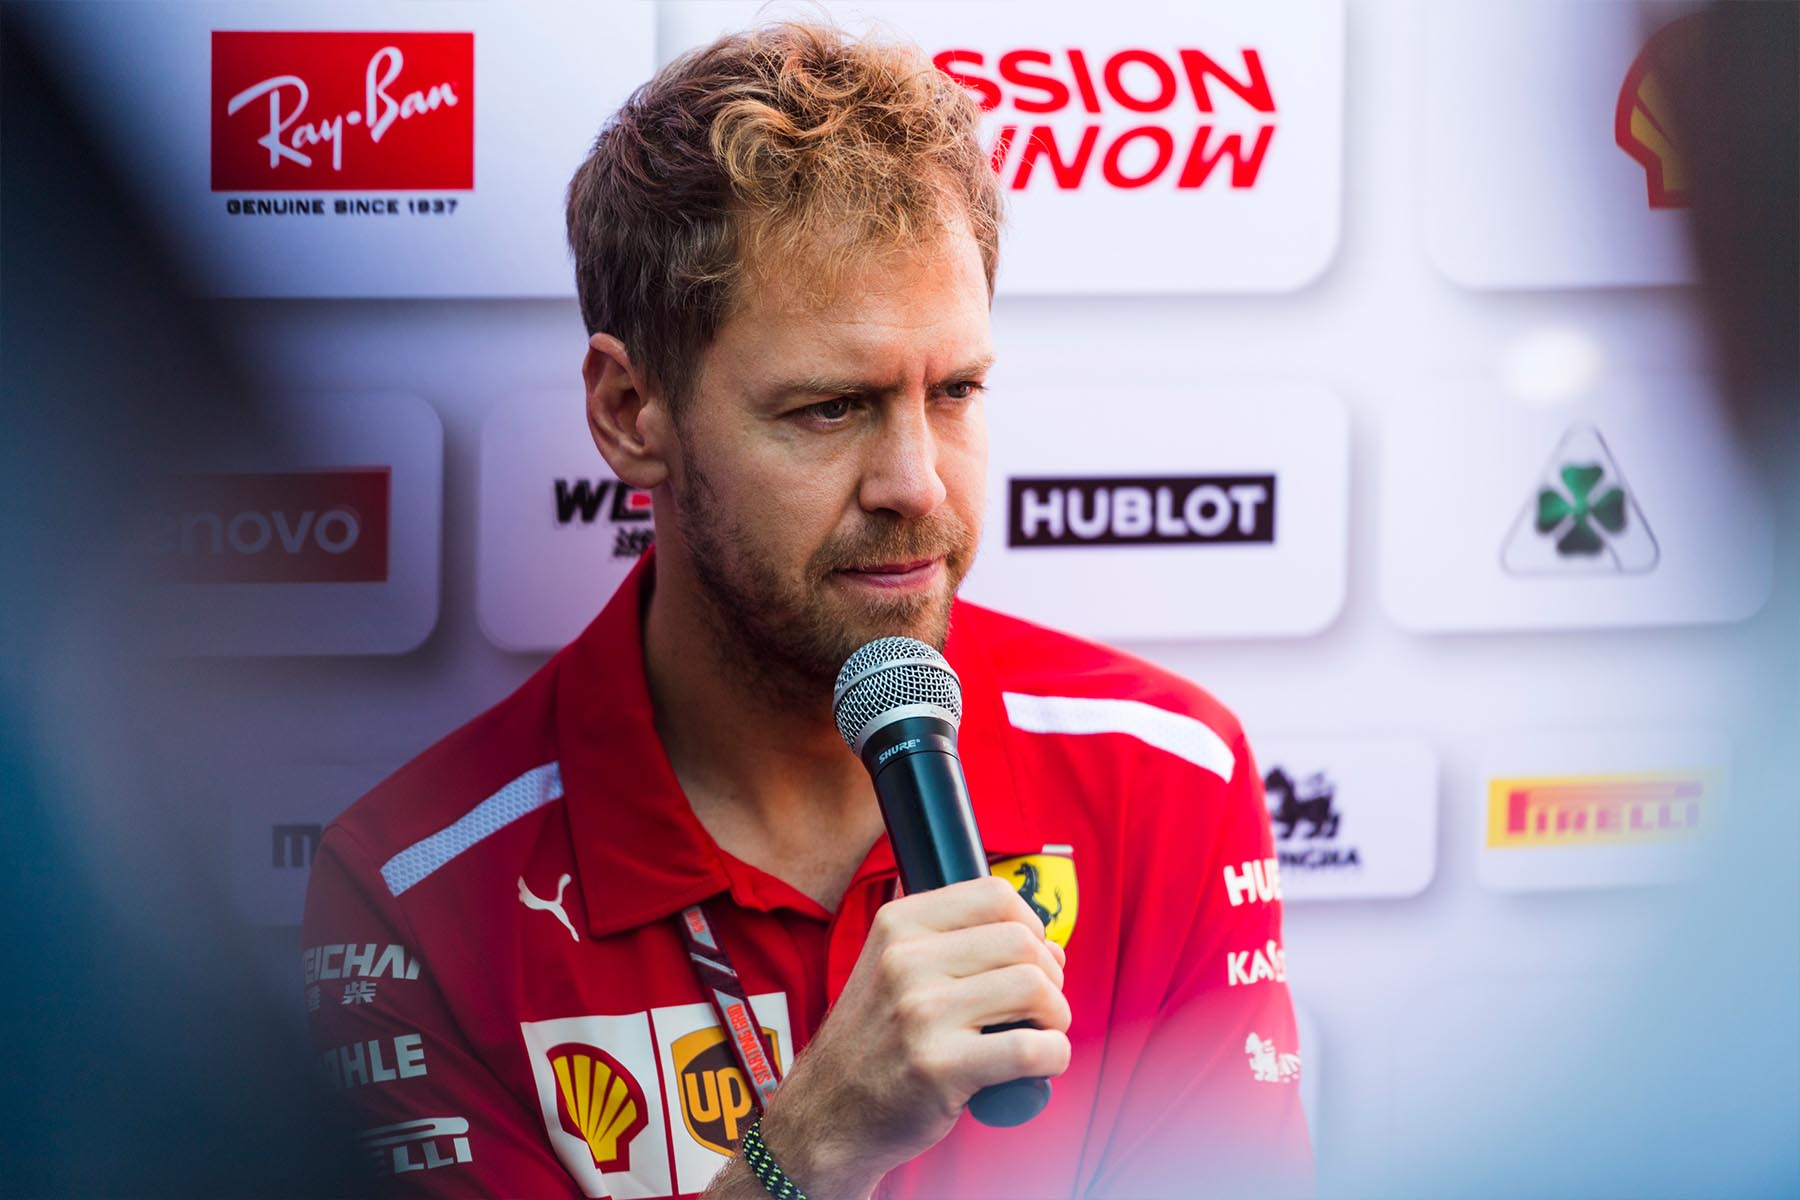 Sebastian Vettel at the 2018 Mexican Grand Prix.